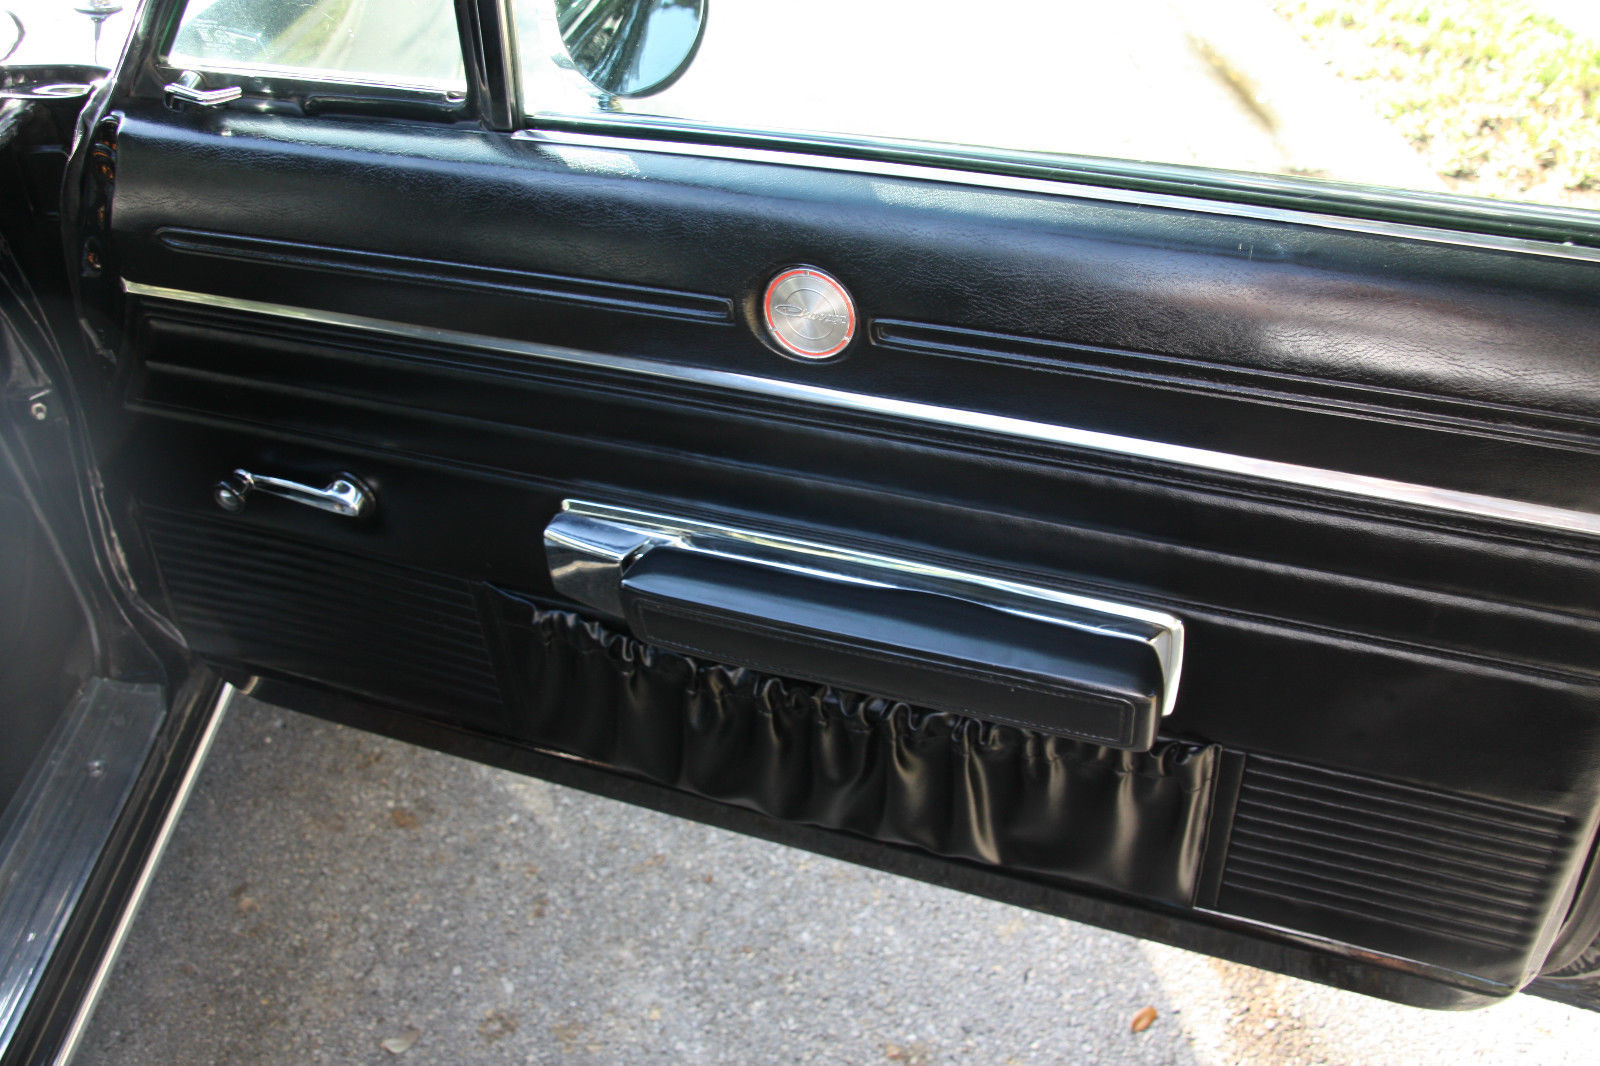 1968 Dodge Charger R T Triple Black 440 Engine Hurst